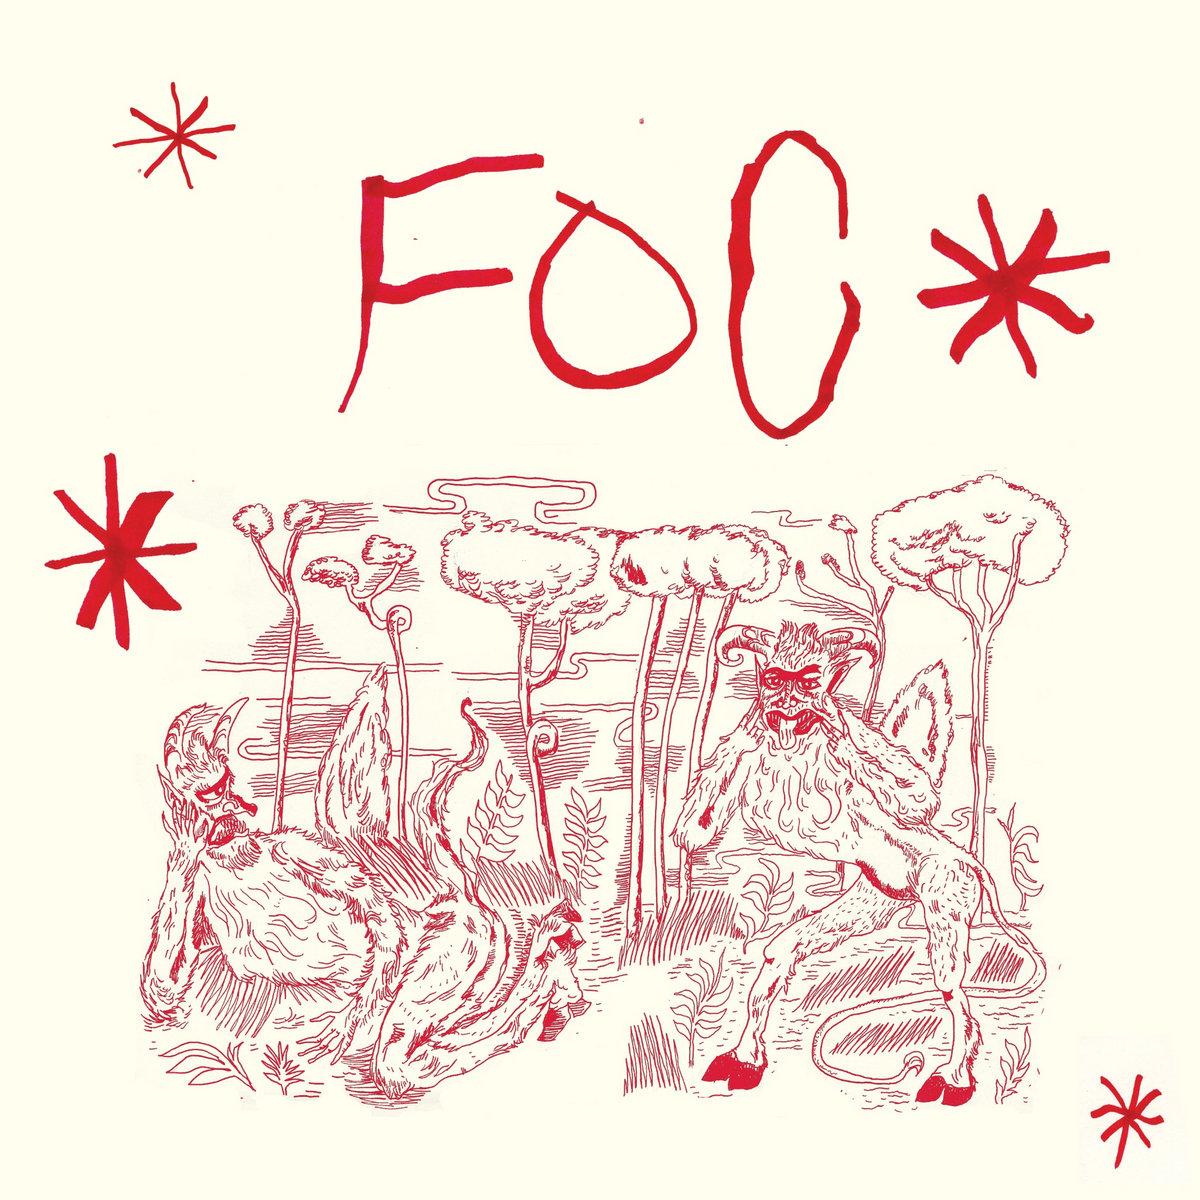 Foc - La Fera Ferotge LP